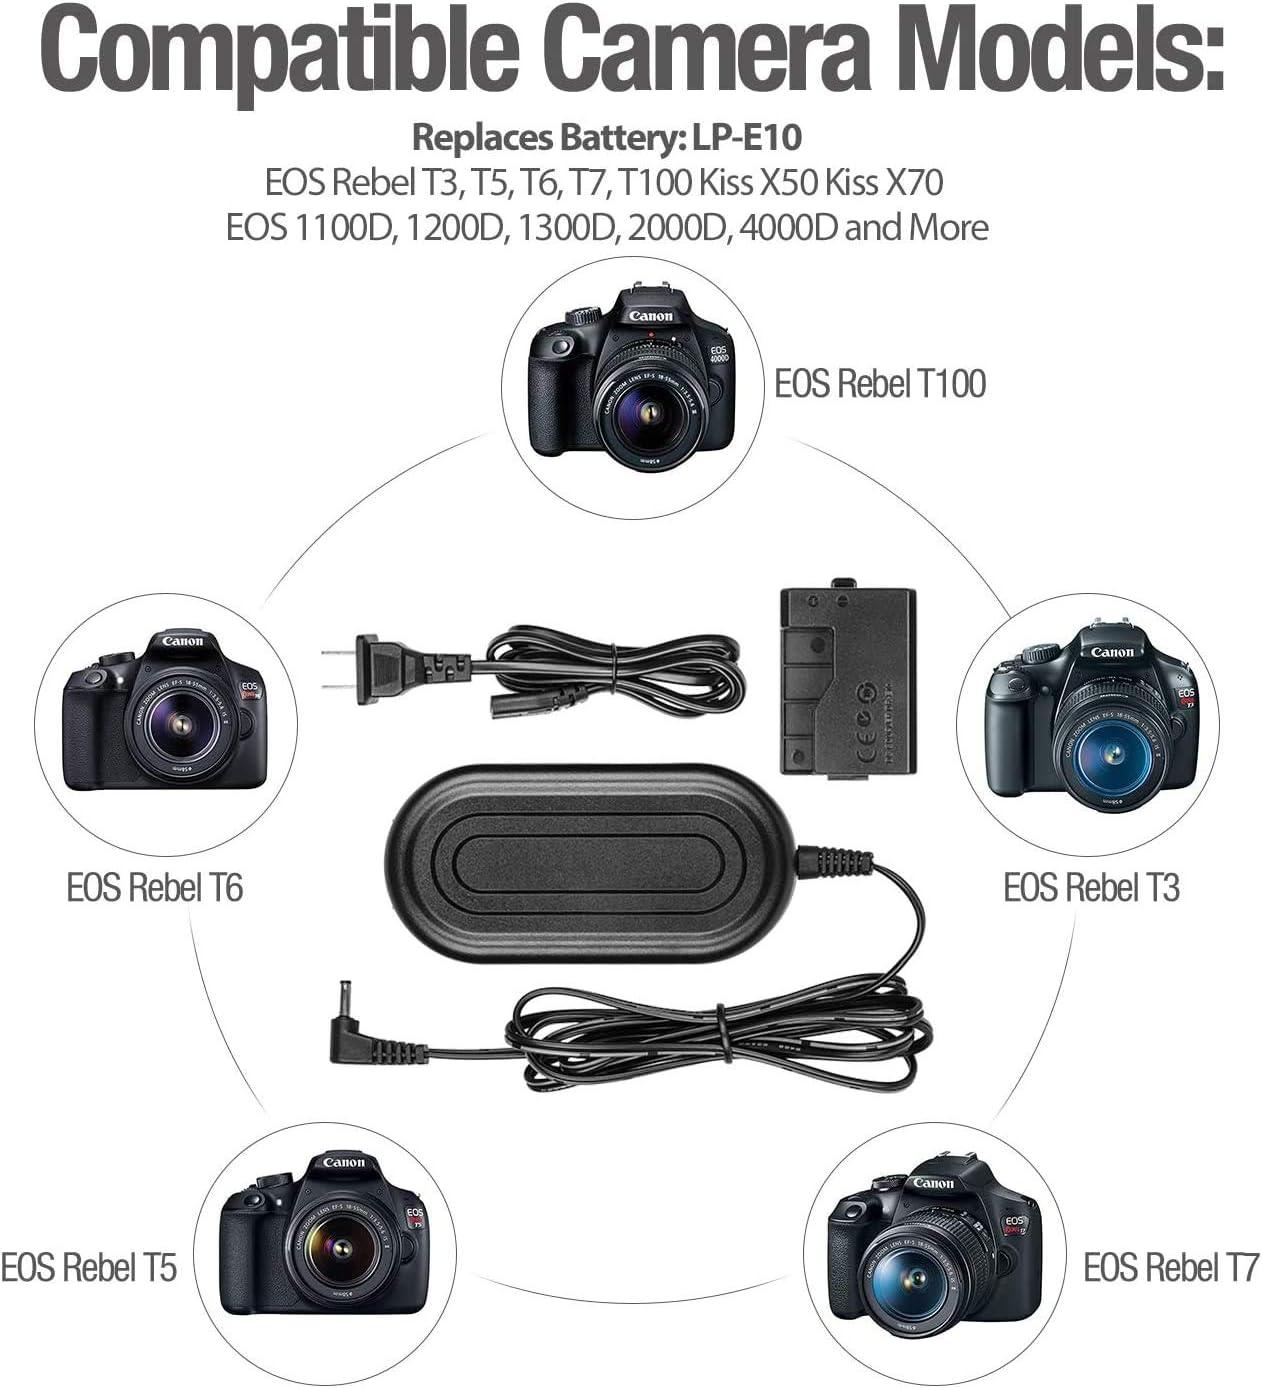 T6 T100 Kiss X50 for Canon EOS Rebel T3 2000D 1300D EOS 1100D ...